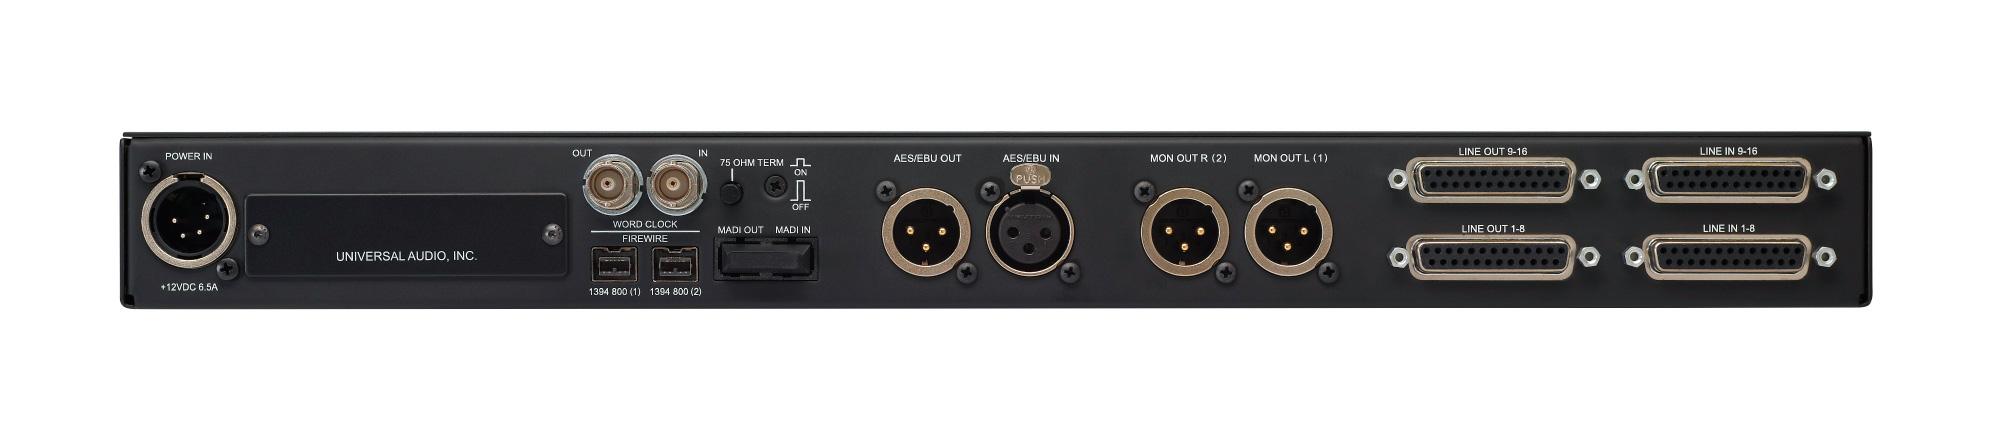 Universal Audio Apollo 16 Quad Audio Interface W Realtime